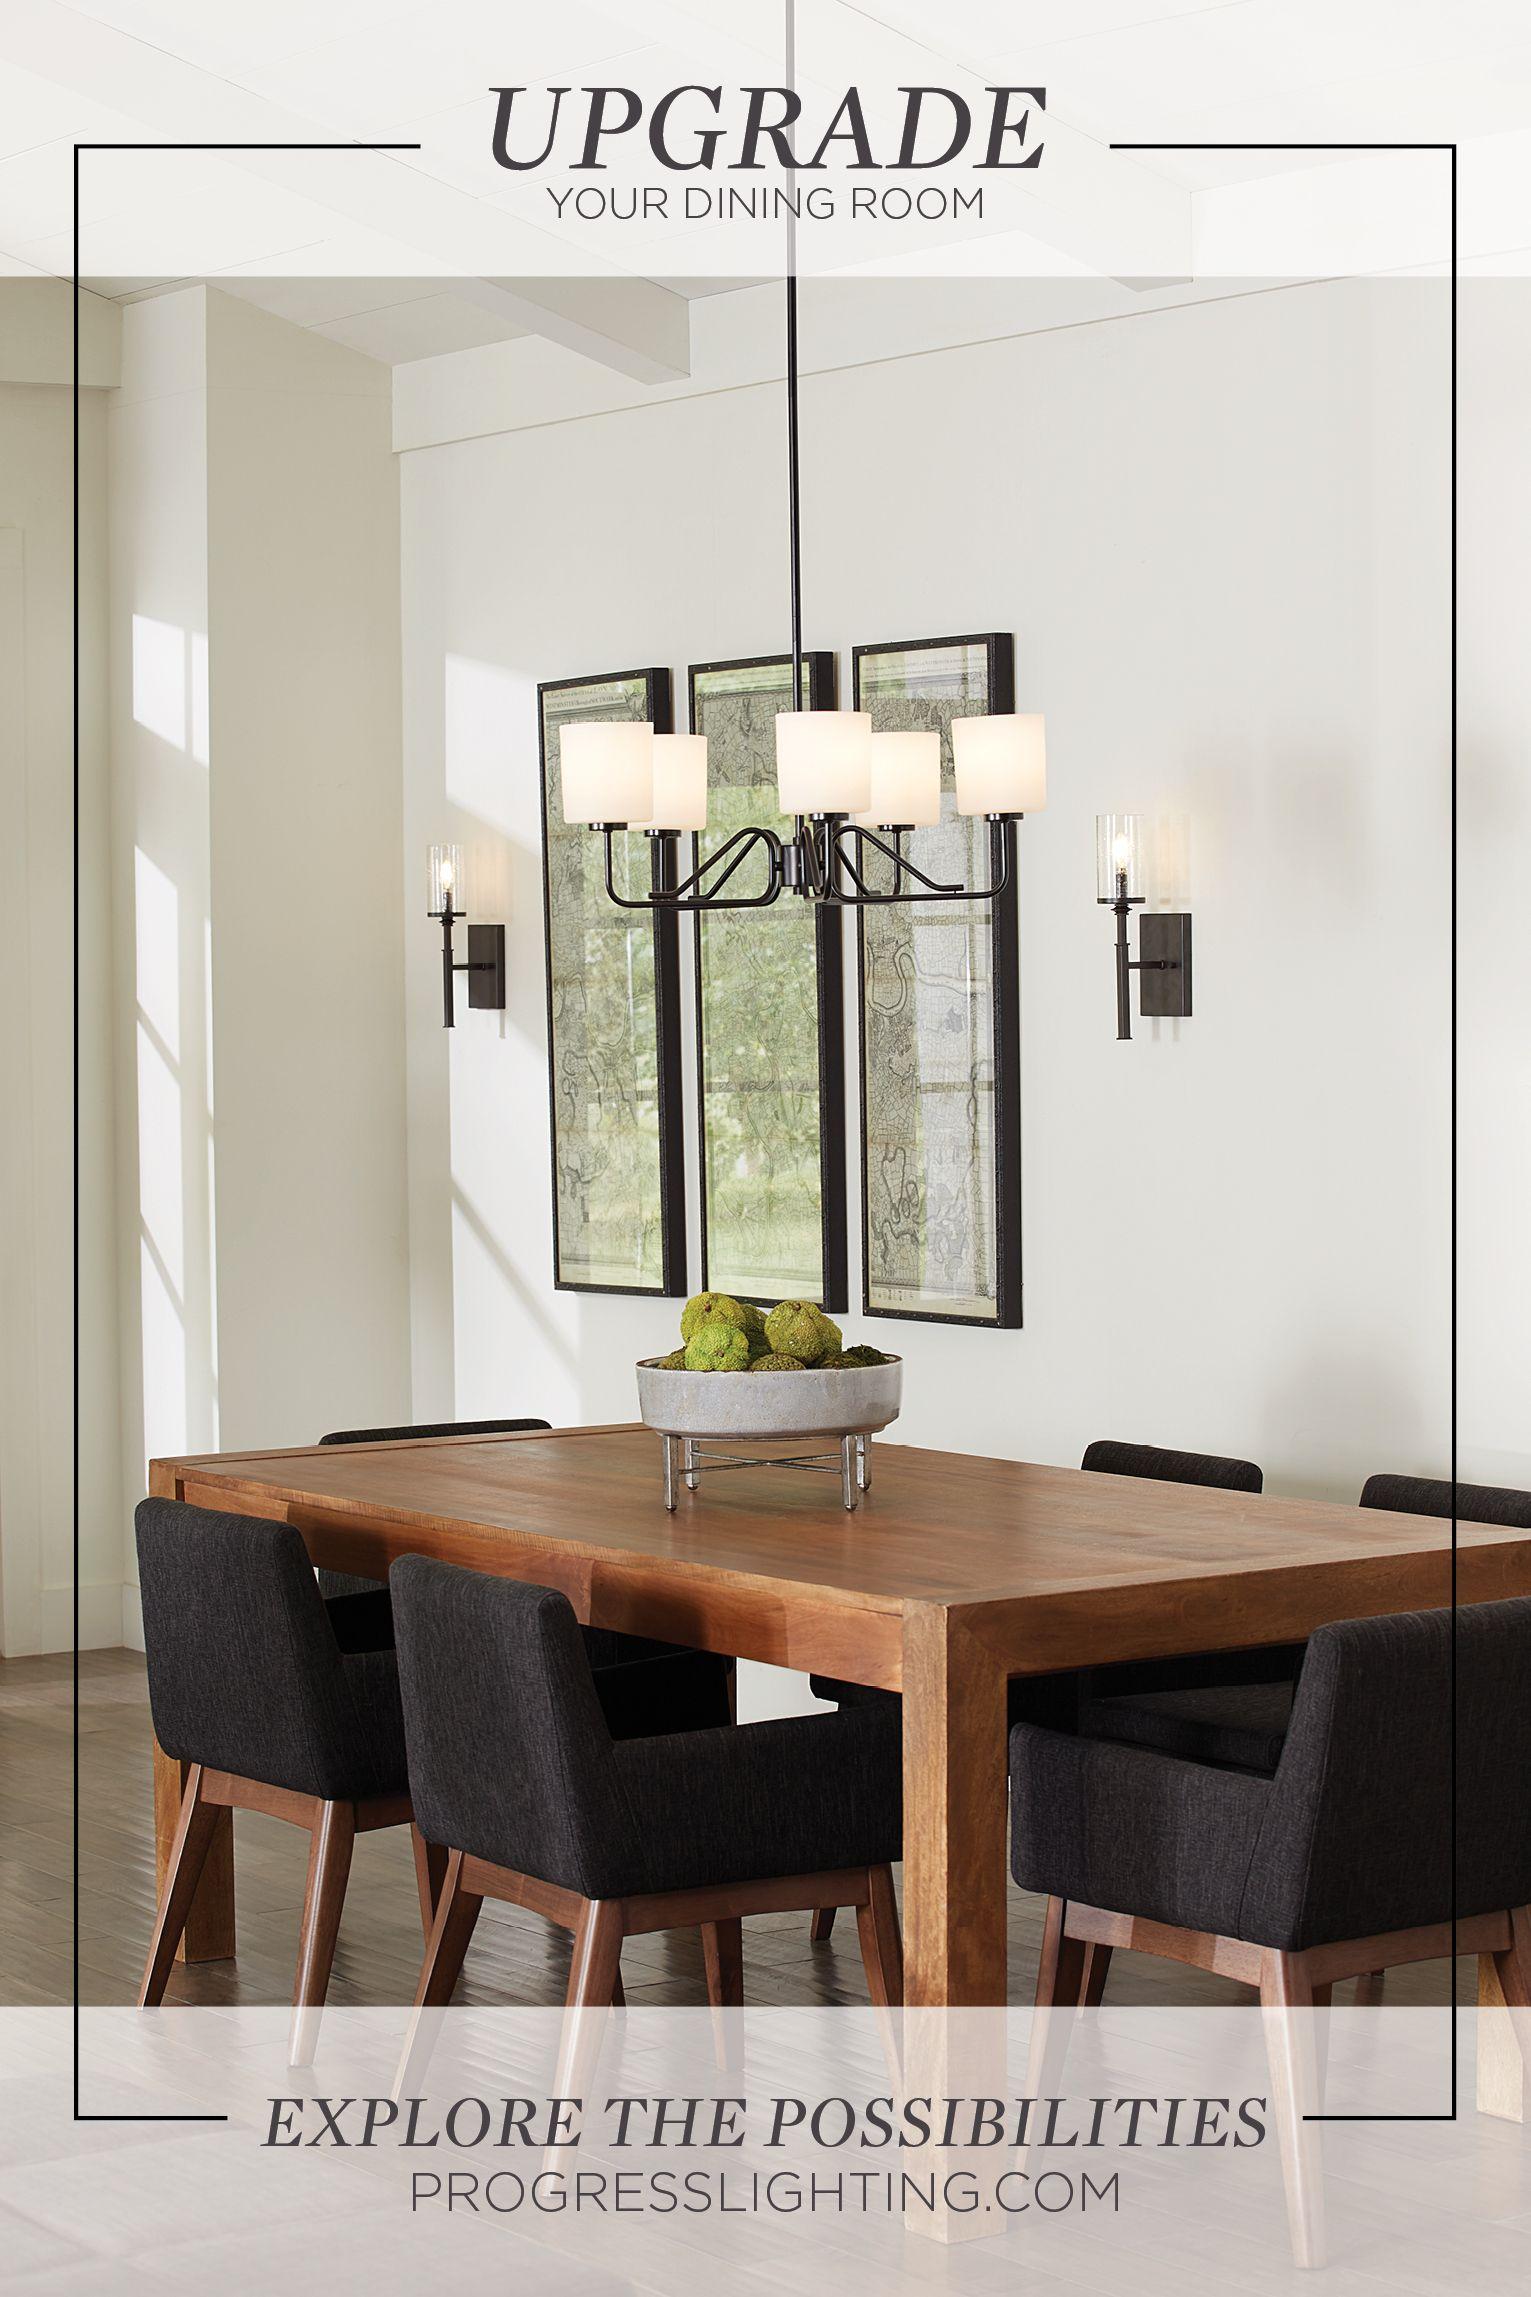 Upgrade Your Dining Room With New Lighting Progress Lighting Modern Dining Room Contemporary Chandelier Dining room progress inspiration